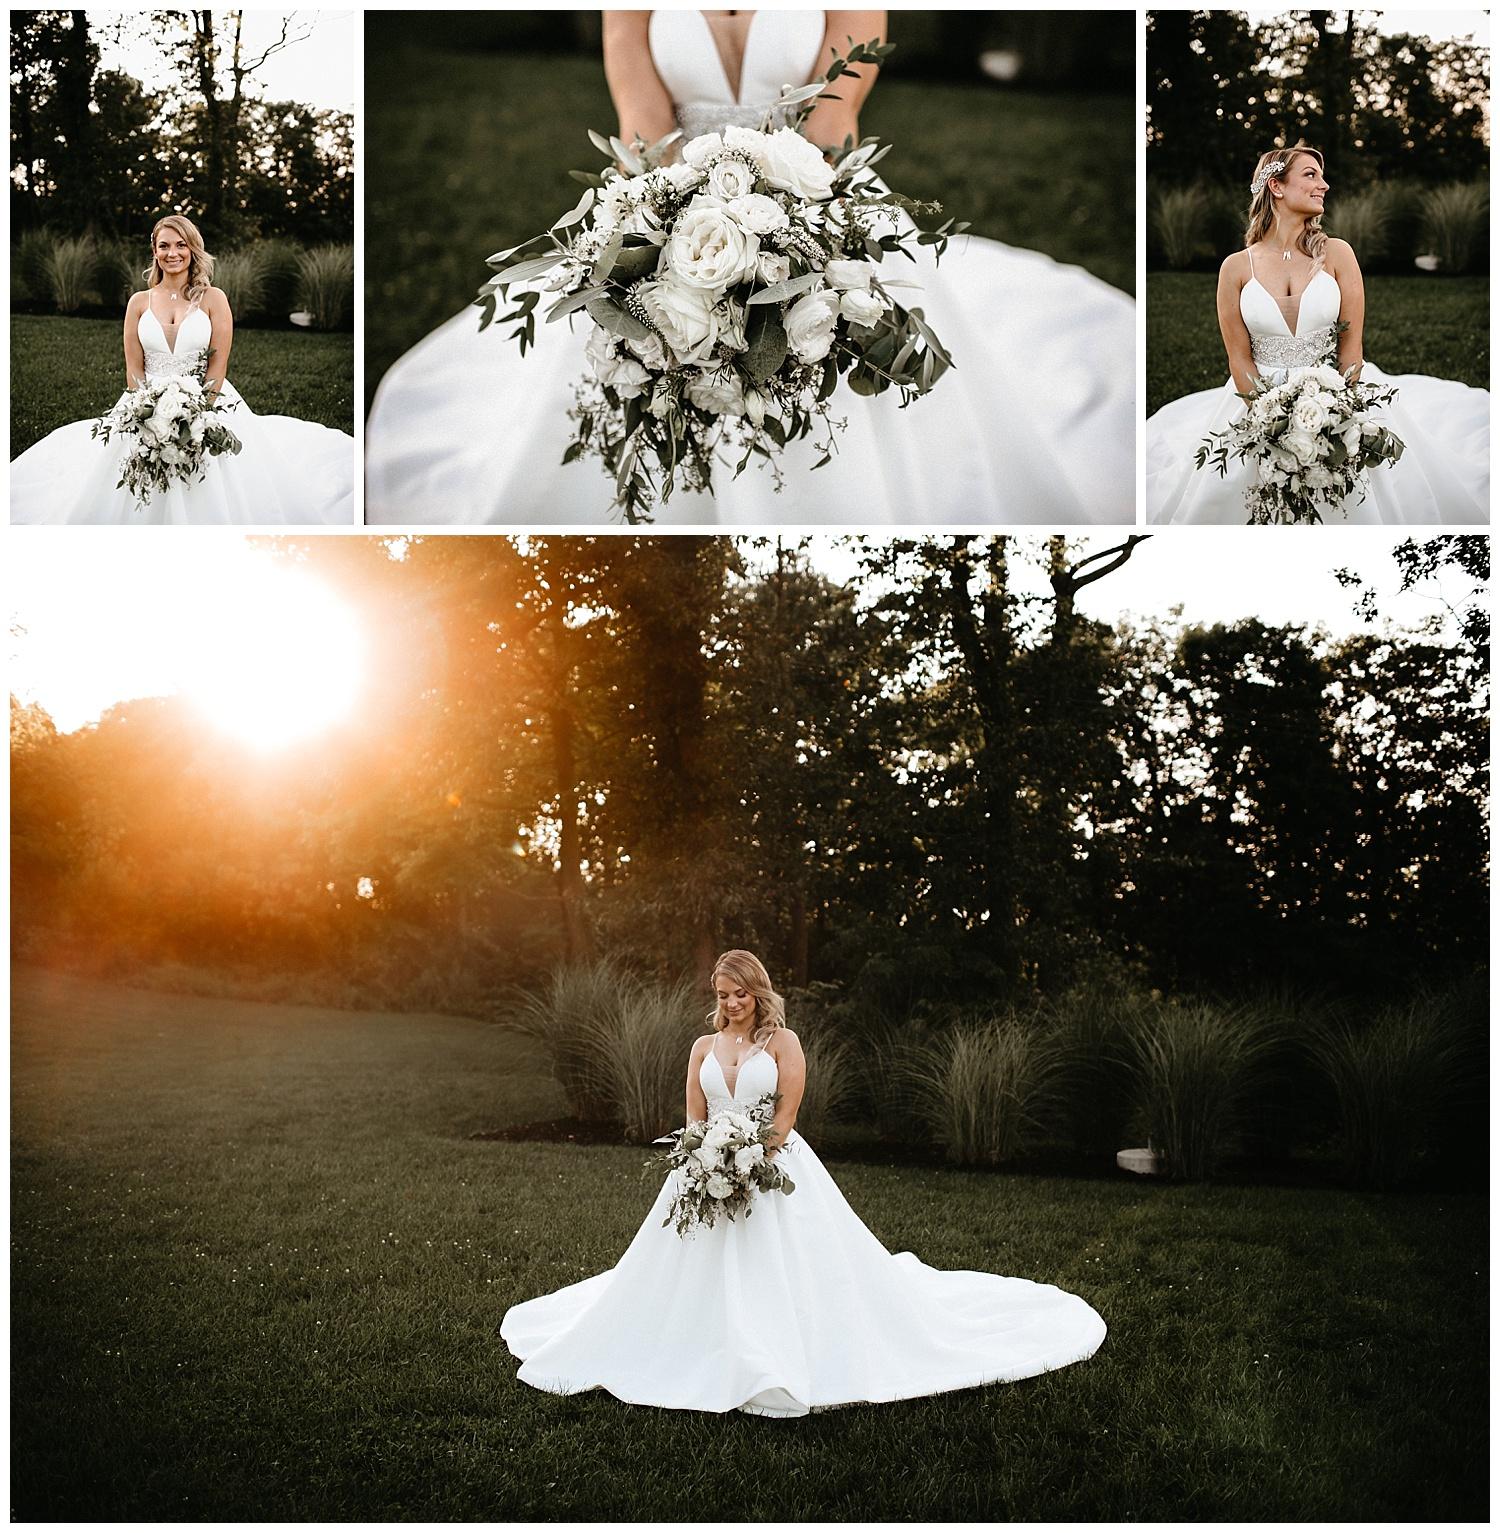 Destination-Wedding-Photographer-in-NEPA-Palmerton-PA_0023.jpg